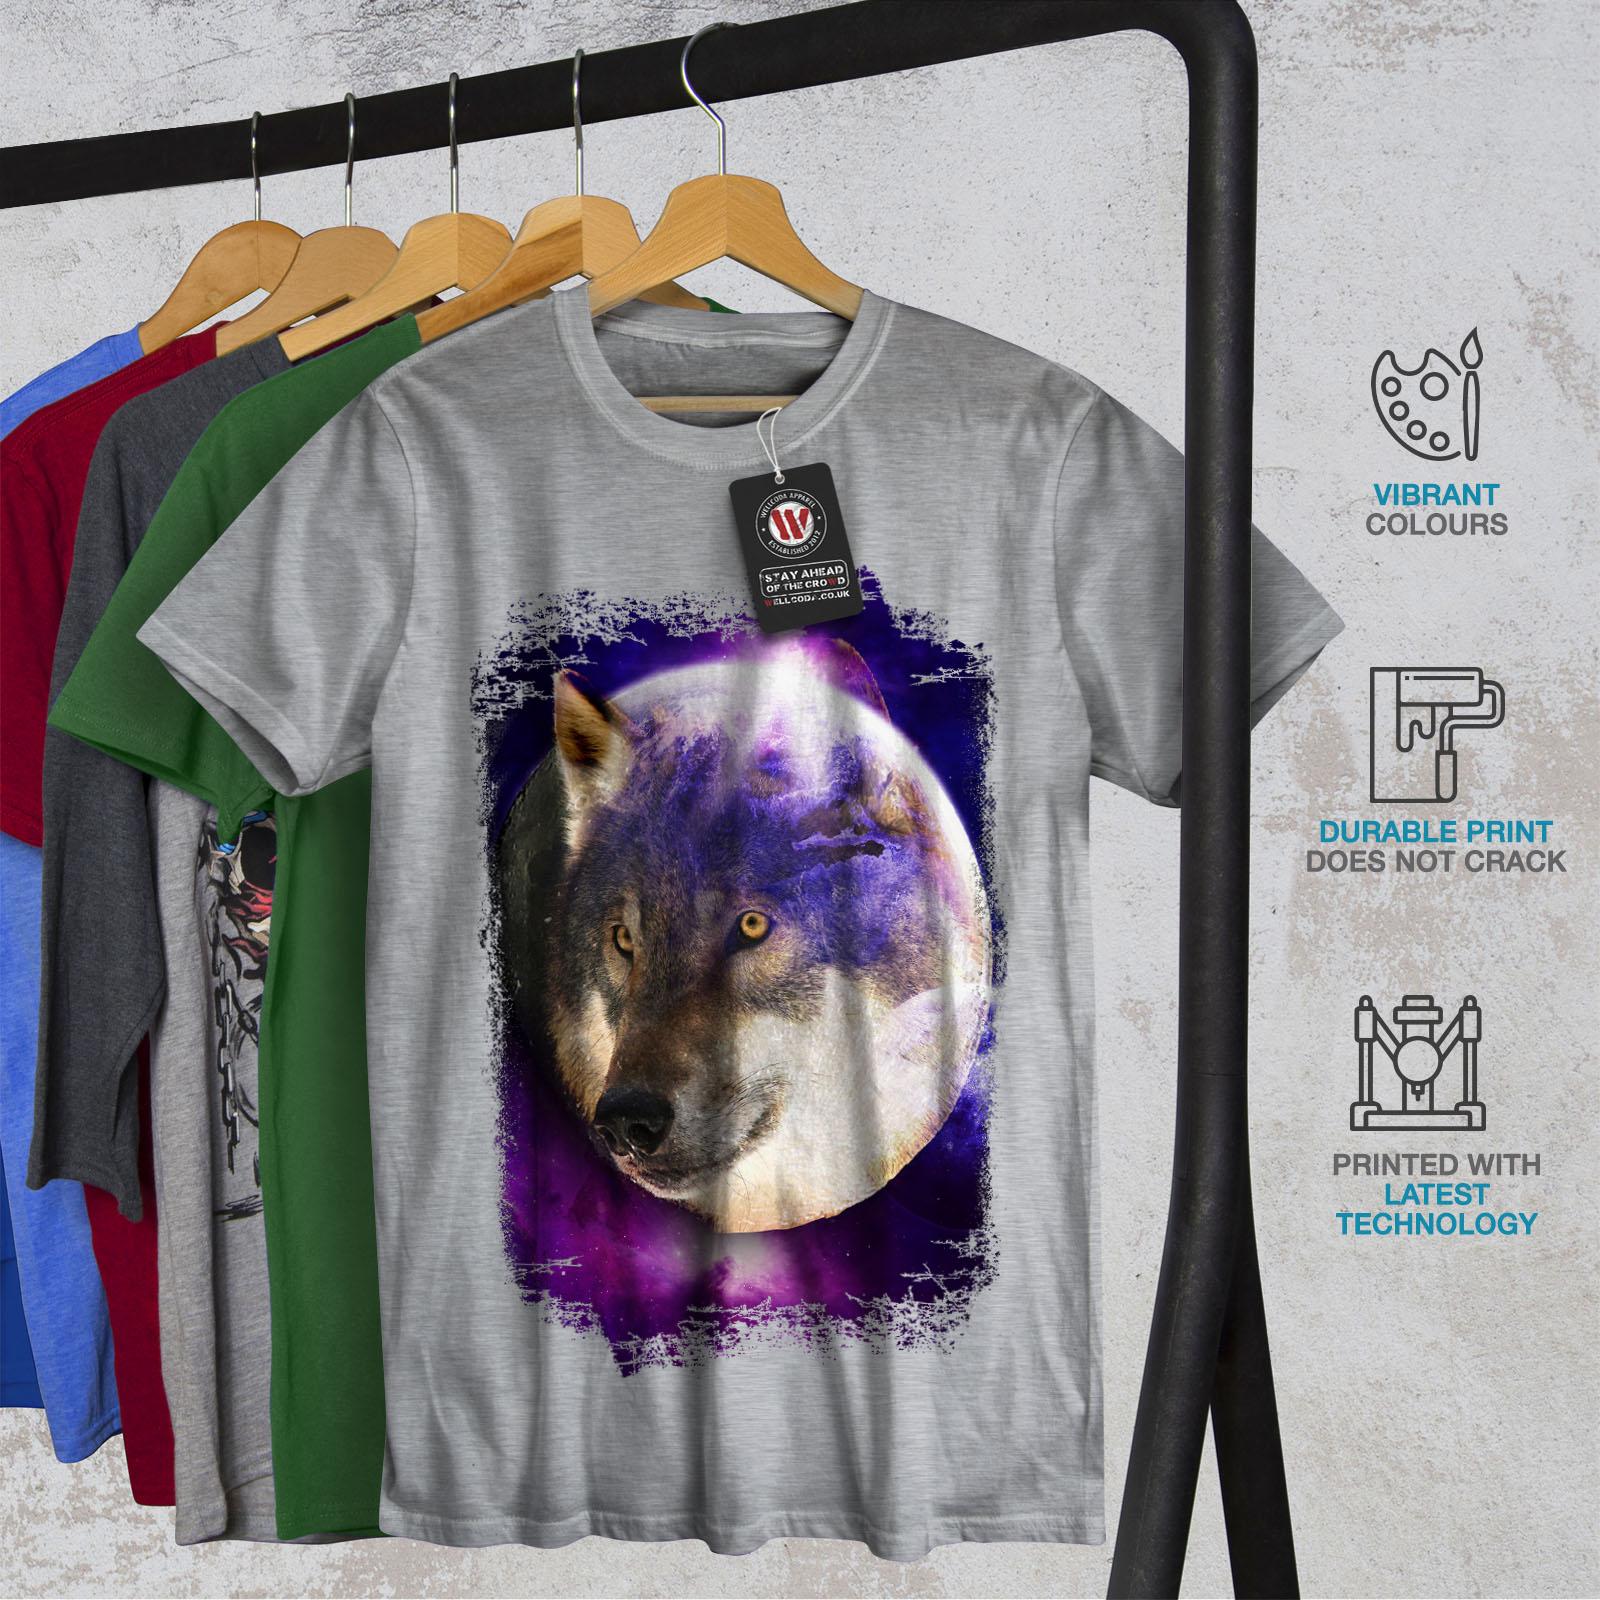 Wellcoda Moon Animal Loup T-shirt homme Animal Visage design graphique imprimé Tee